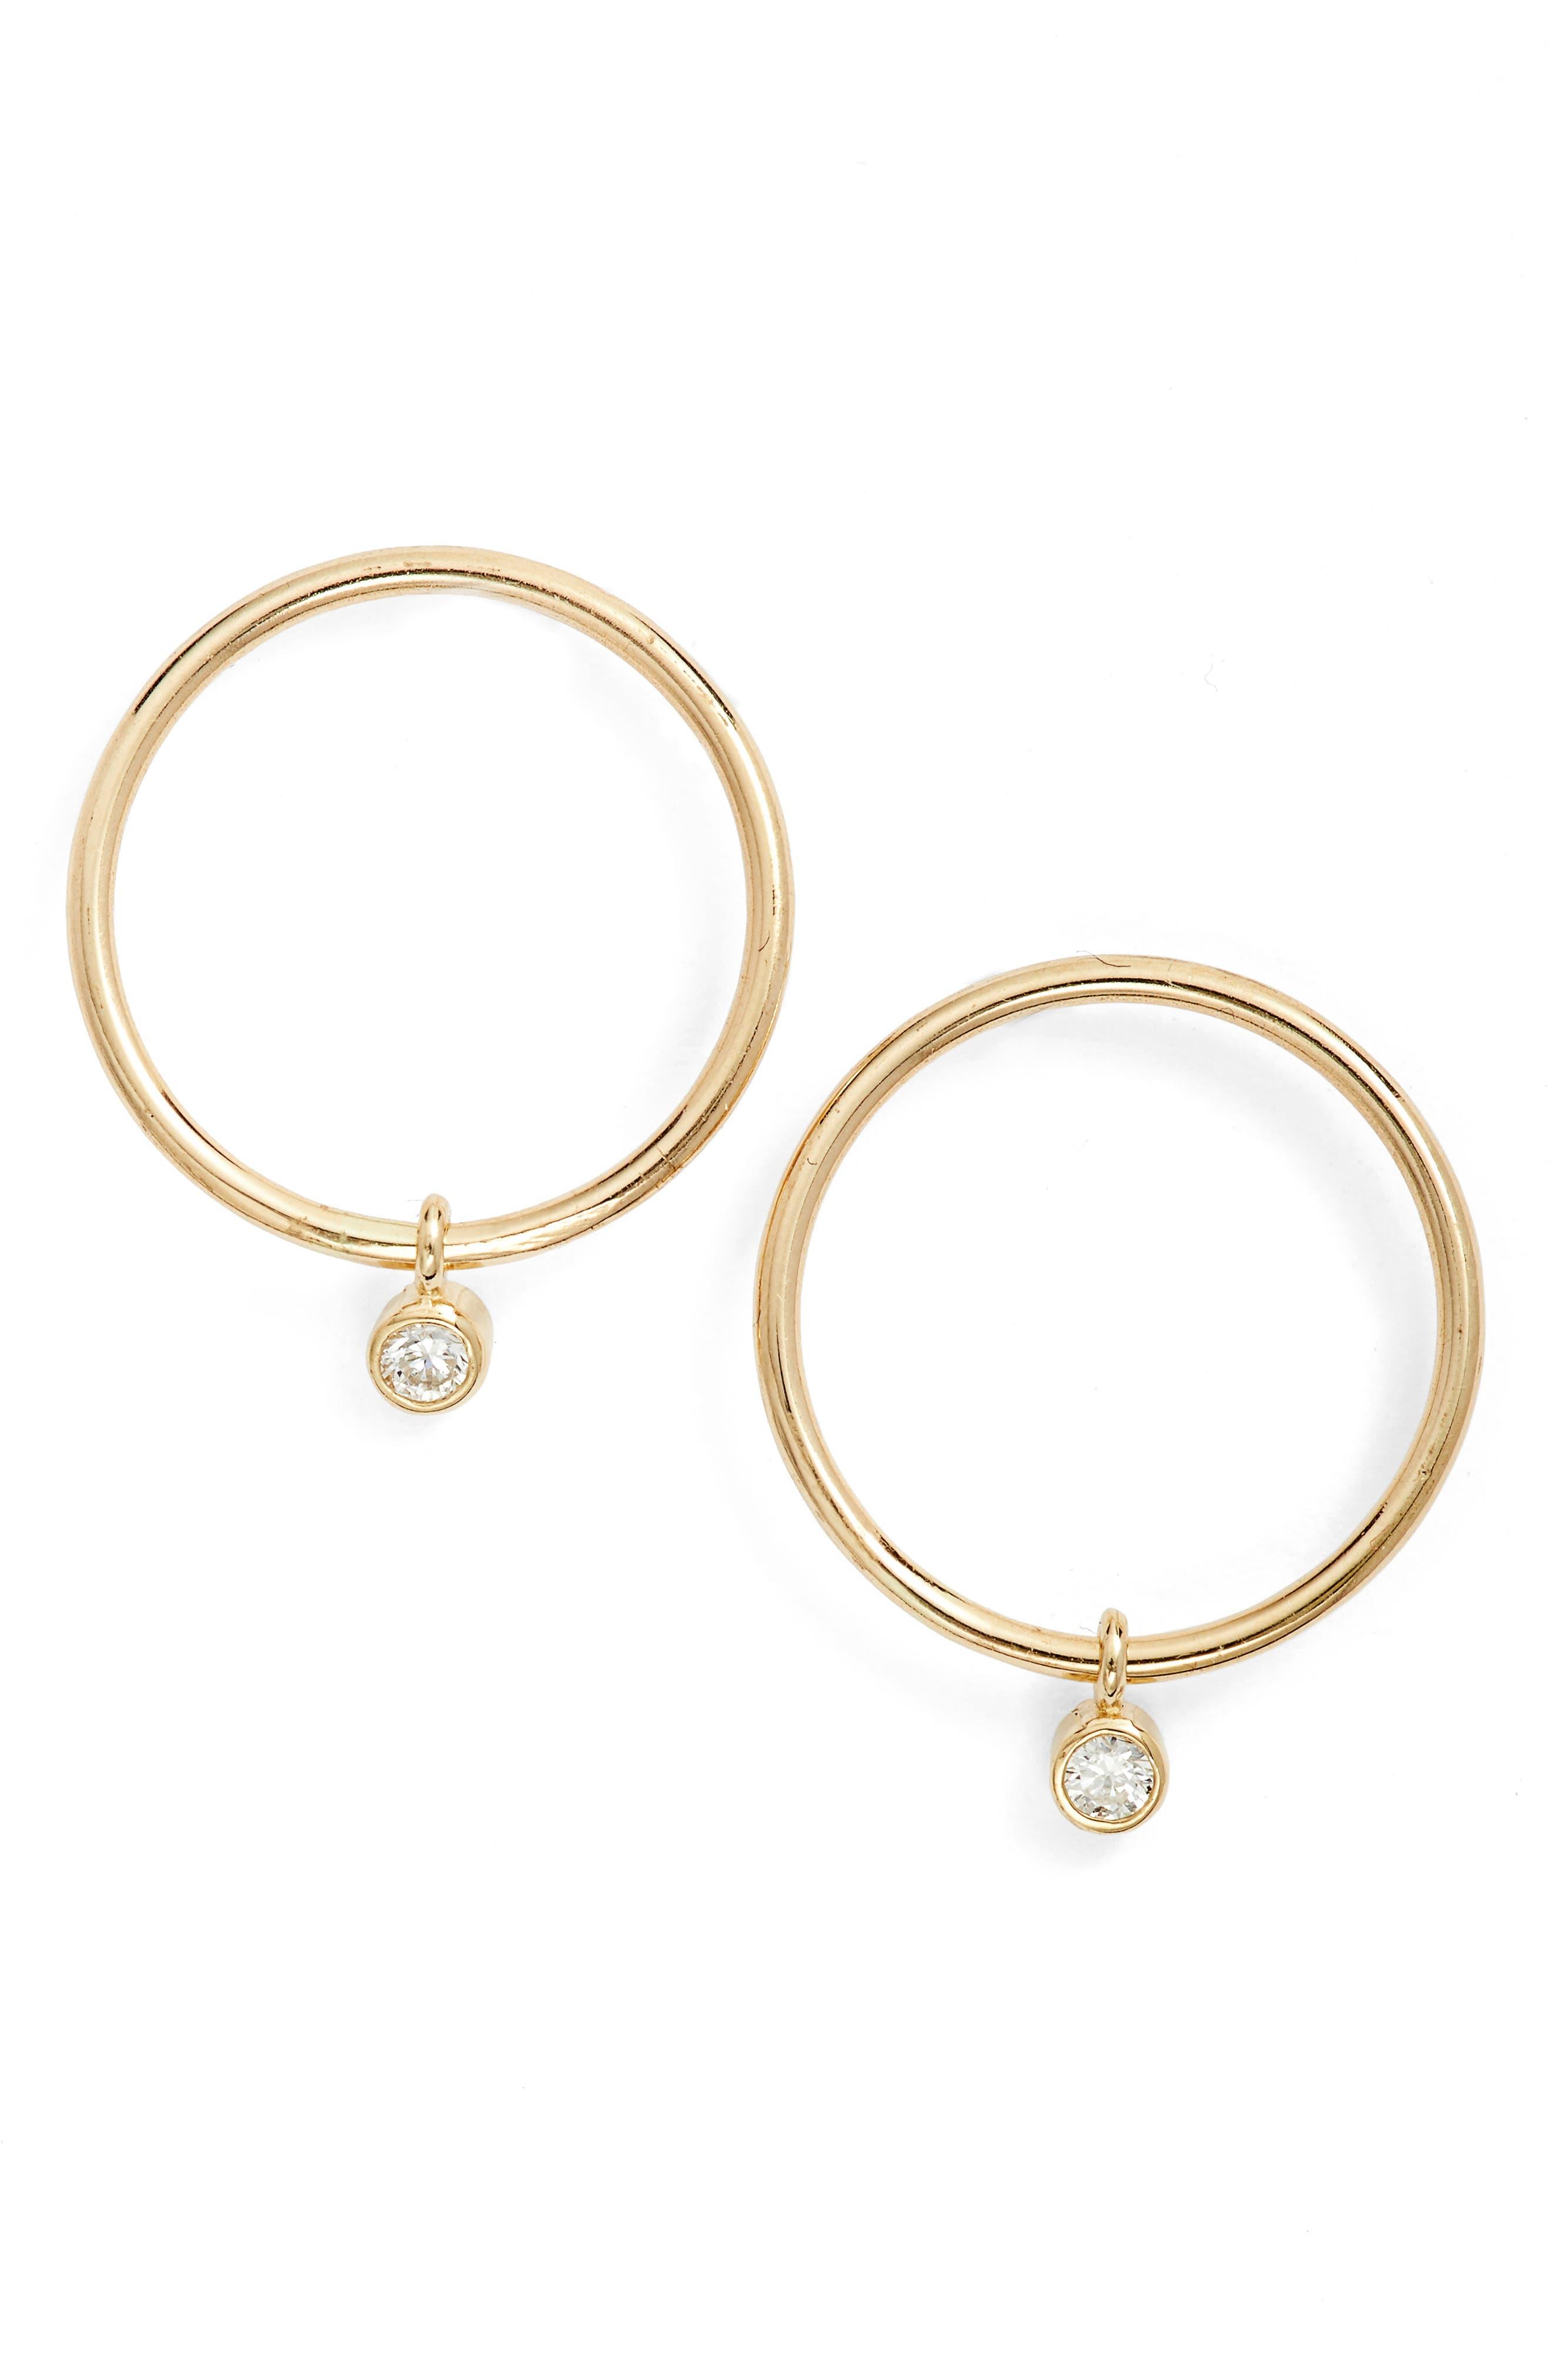 Main Image - Zoë Chicco Diamond Small Frontal Hoop Earrings